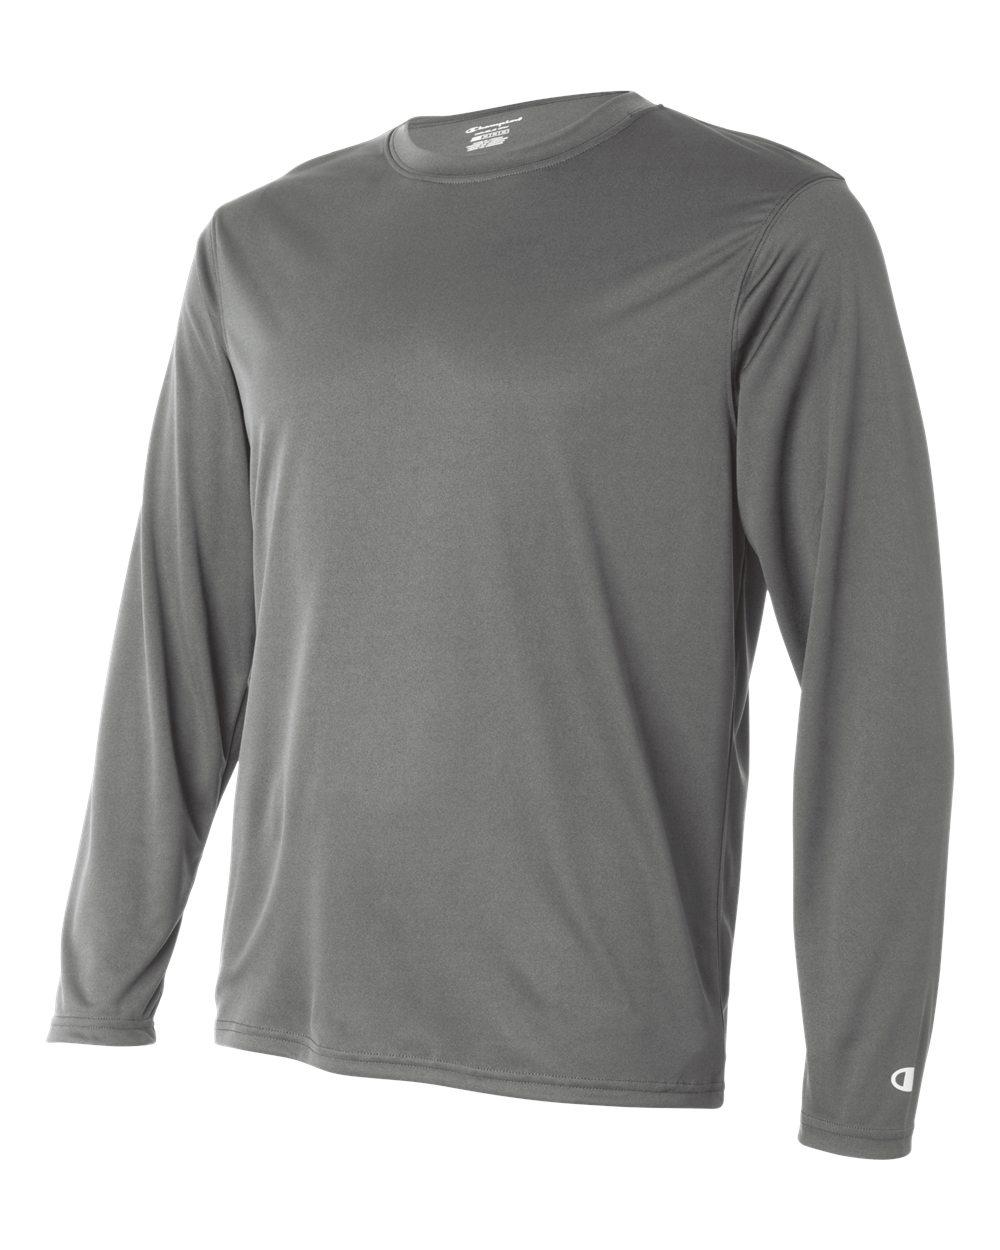 Champion-Men-039-s-Double-Dry-4-1-oz-Long-Sleeve-Interlock-T-Shirt-CW26-XS-3XL thumbnail 29